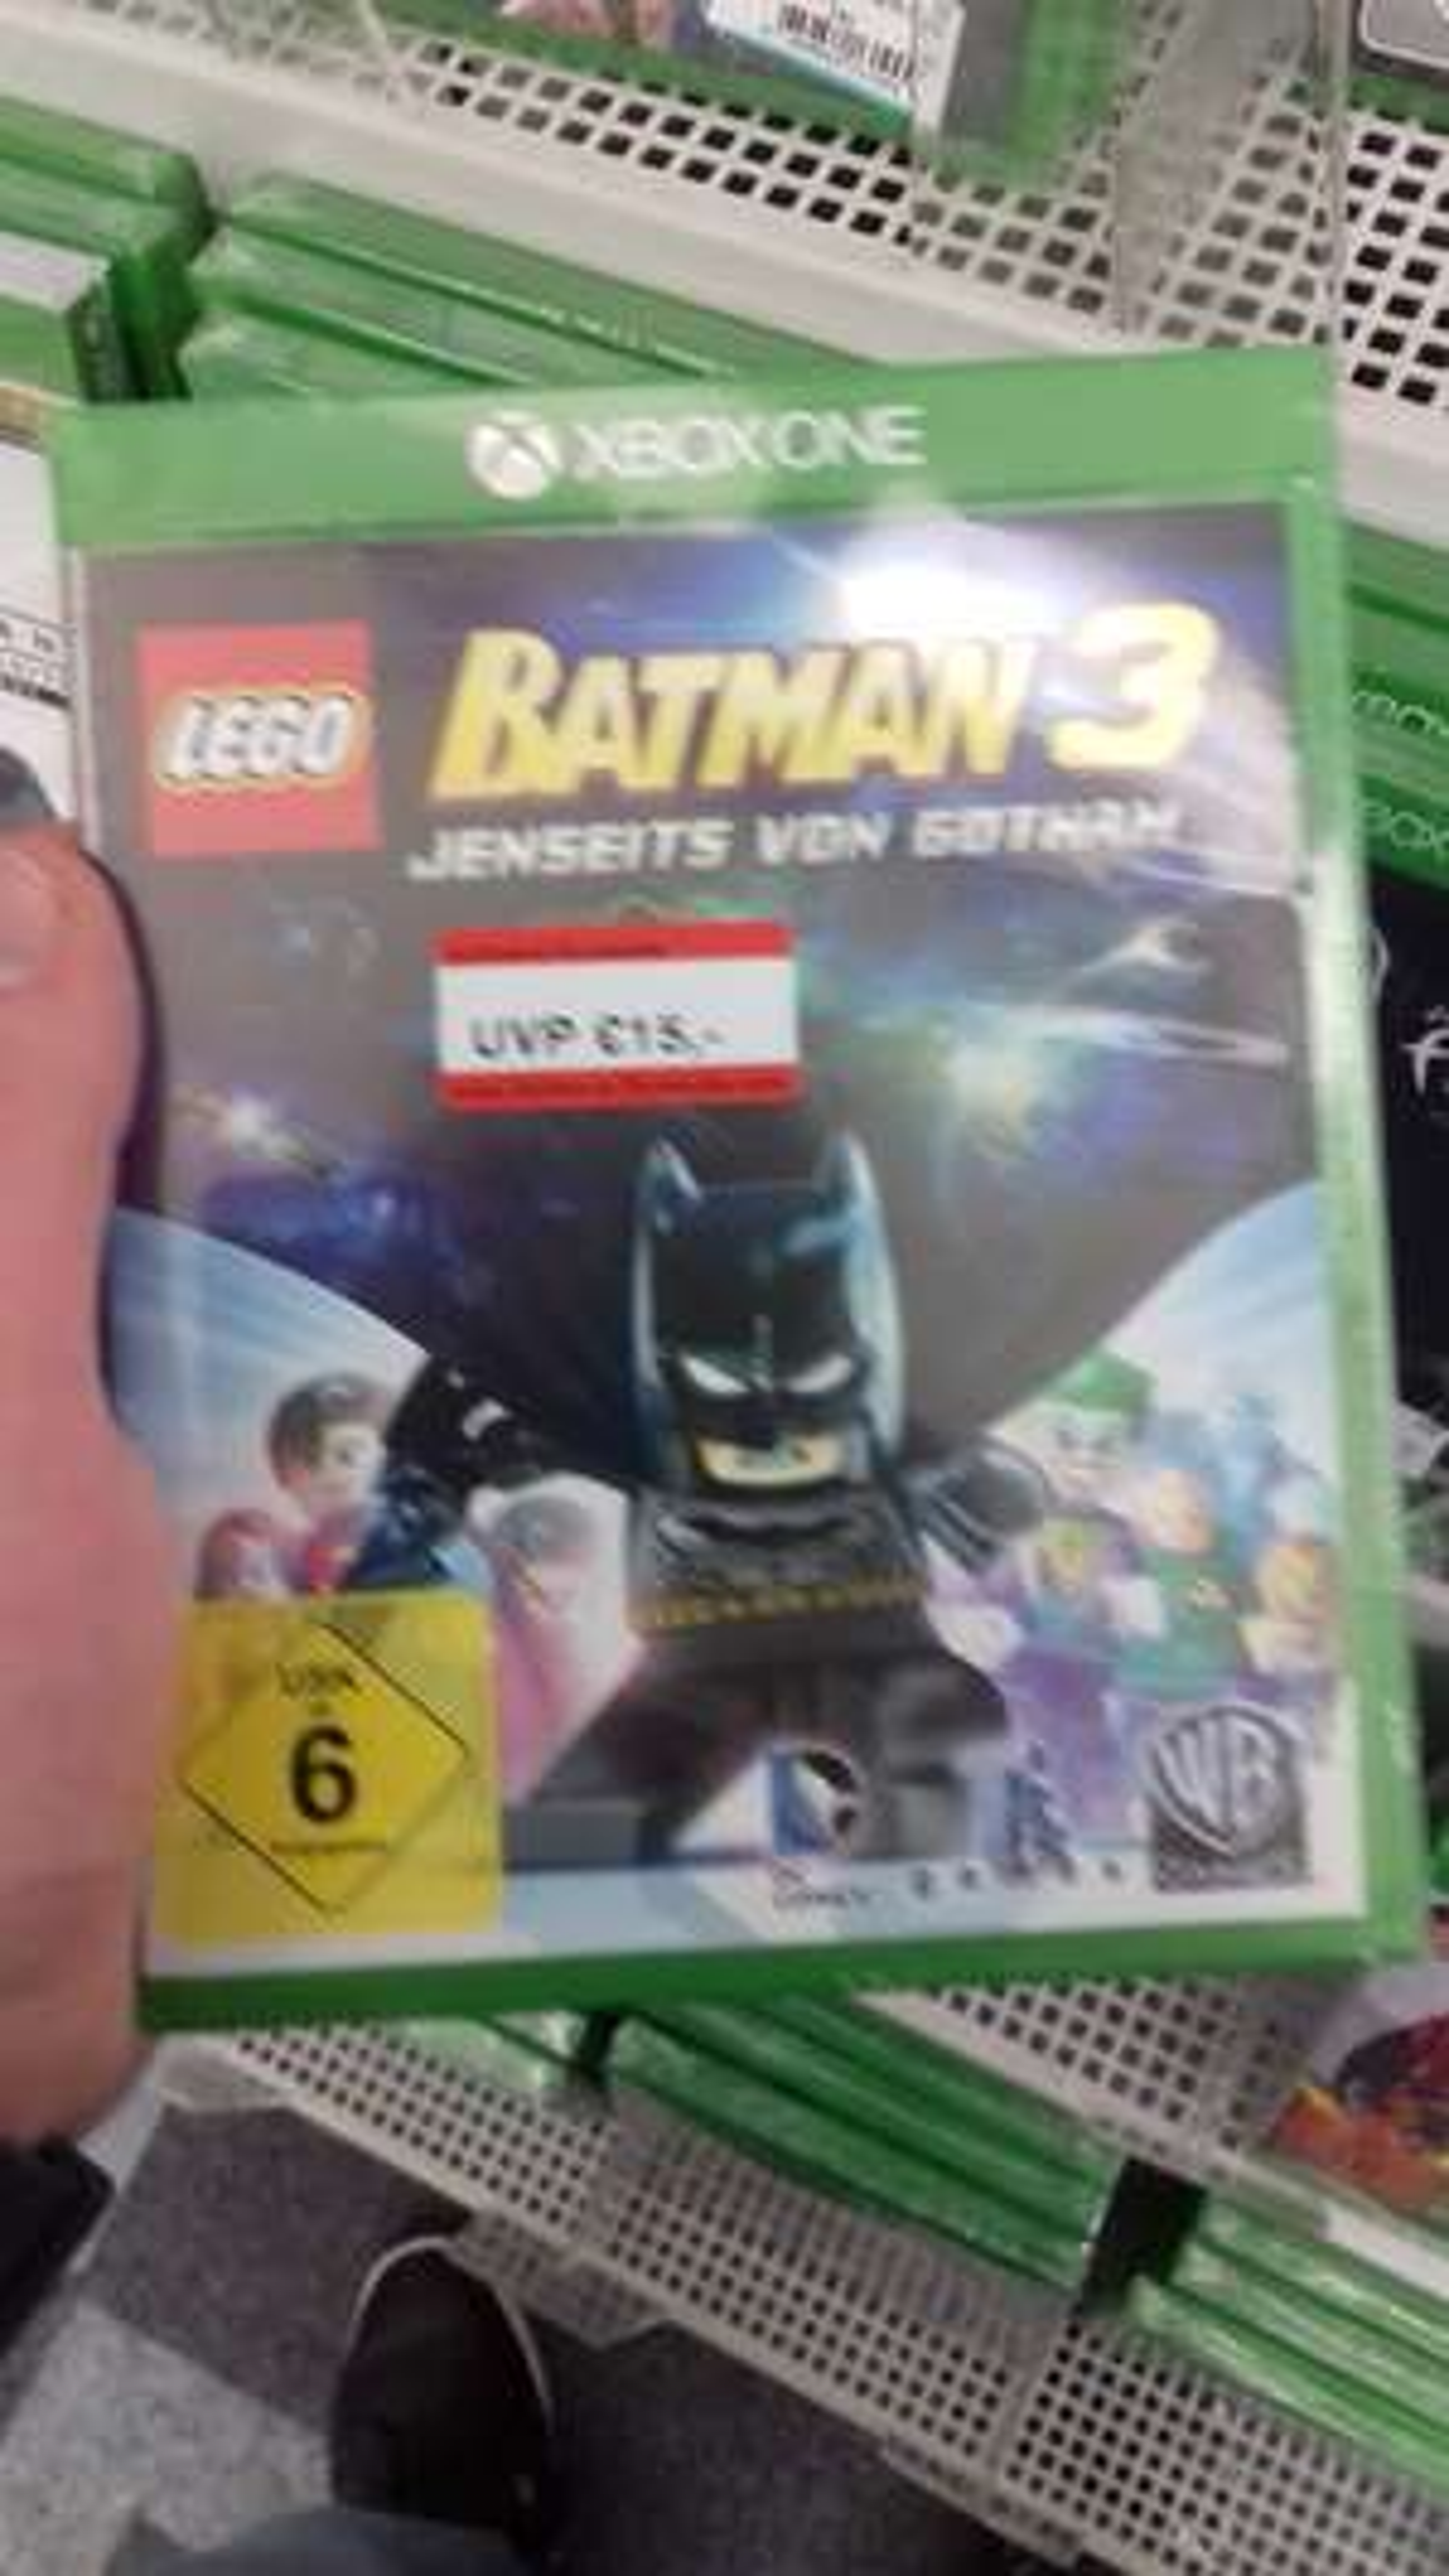 Lego Batman und Mordors Schatten je 15 Euro Lokal in Media Markt  Wilhelmshaven